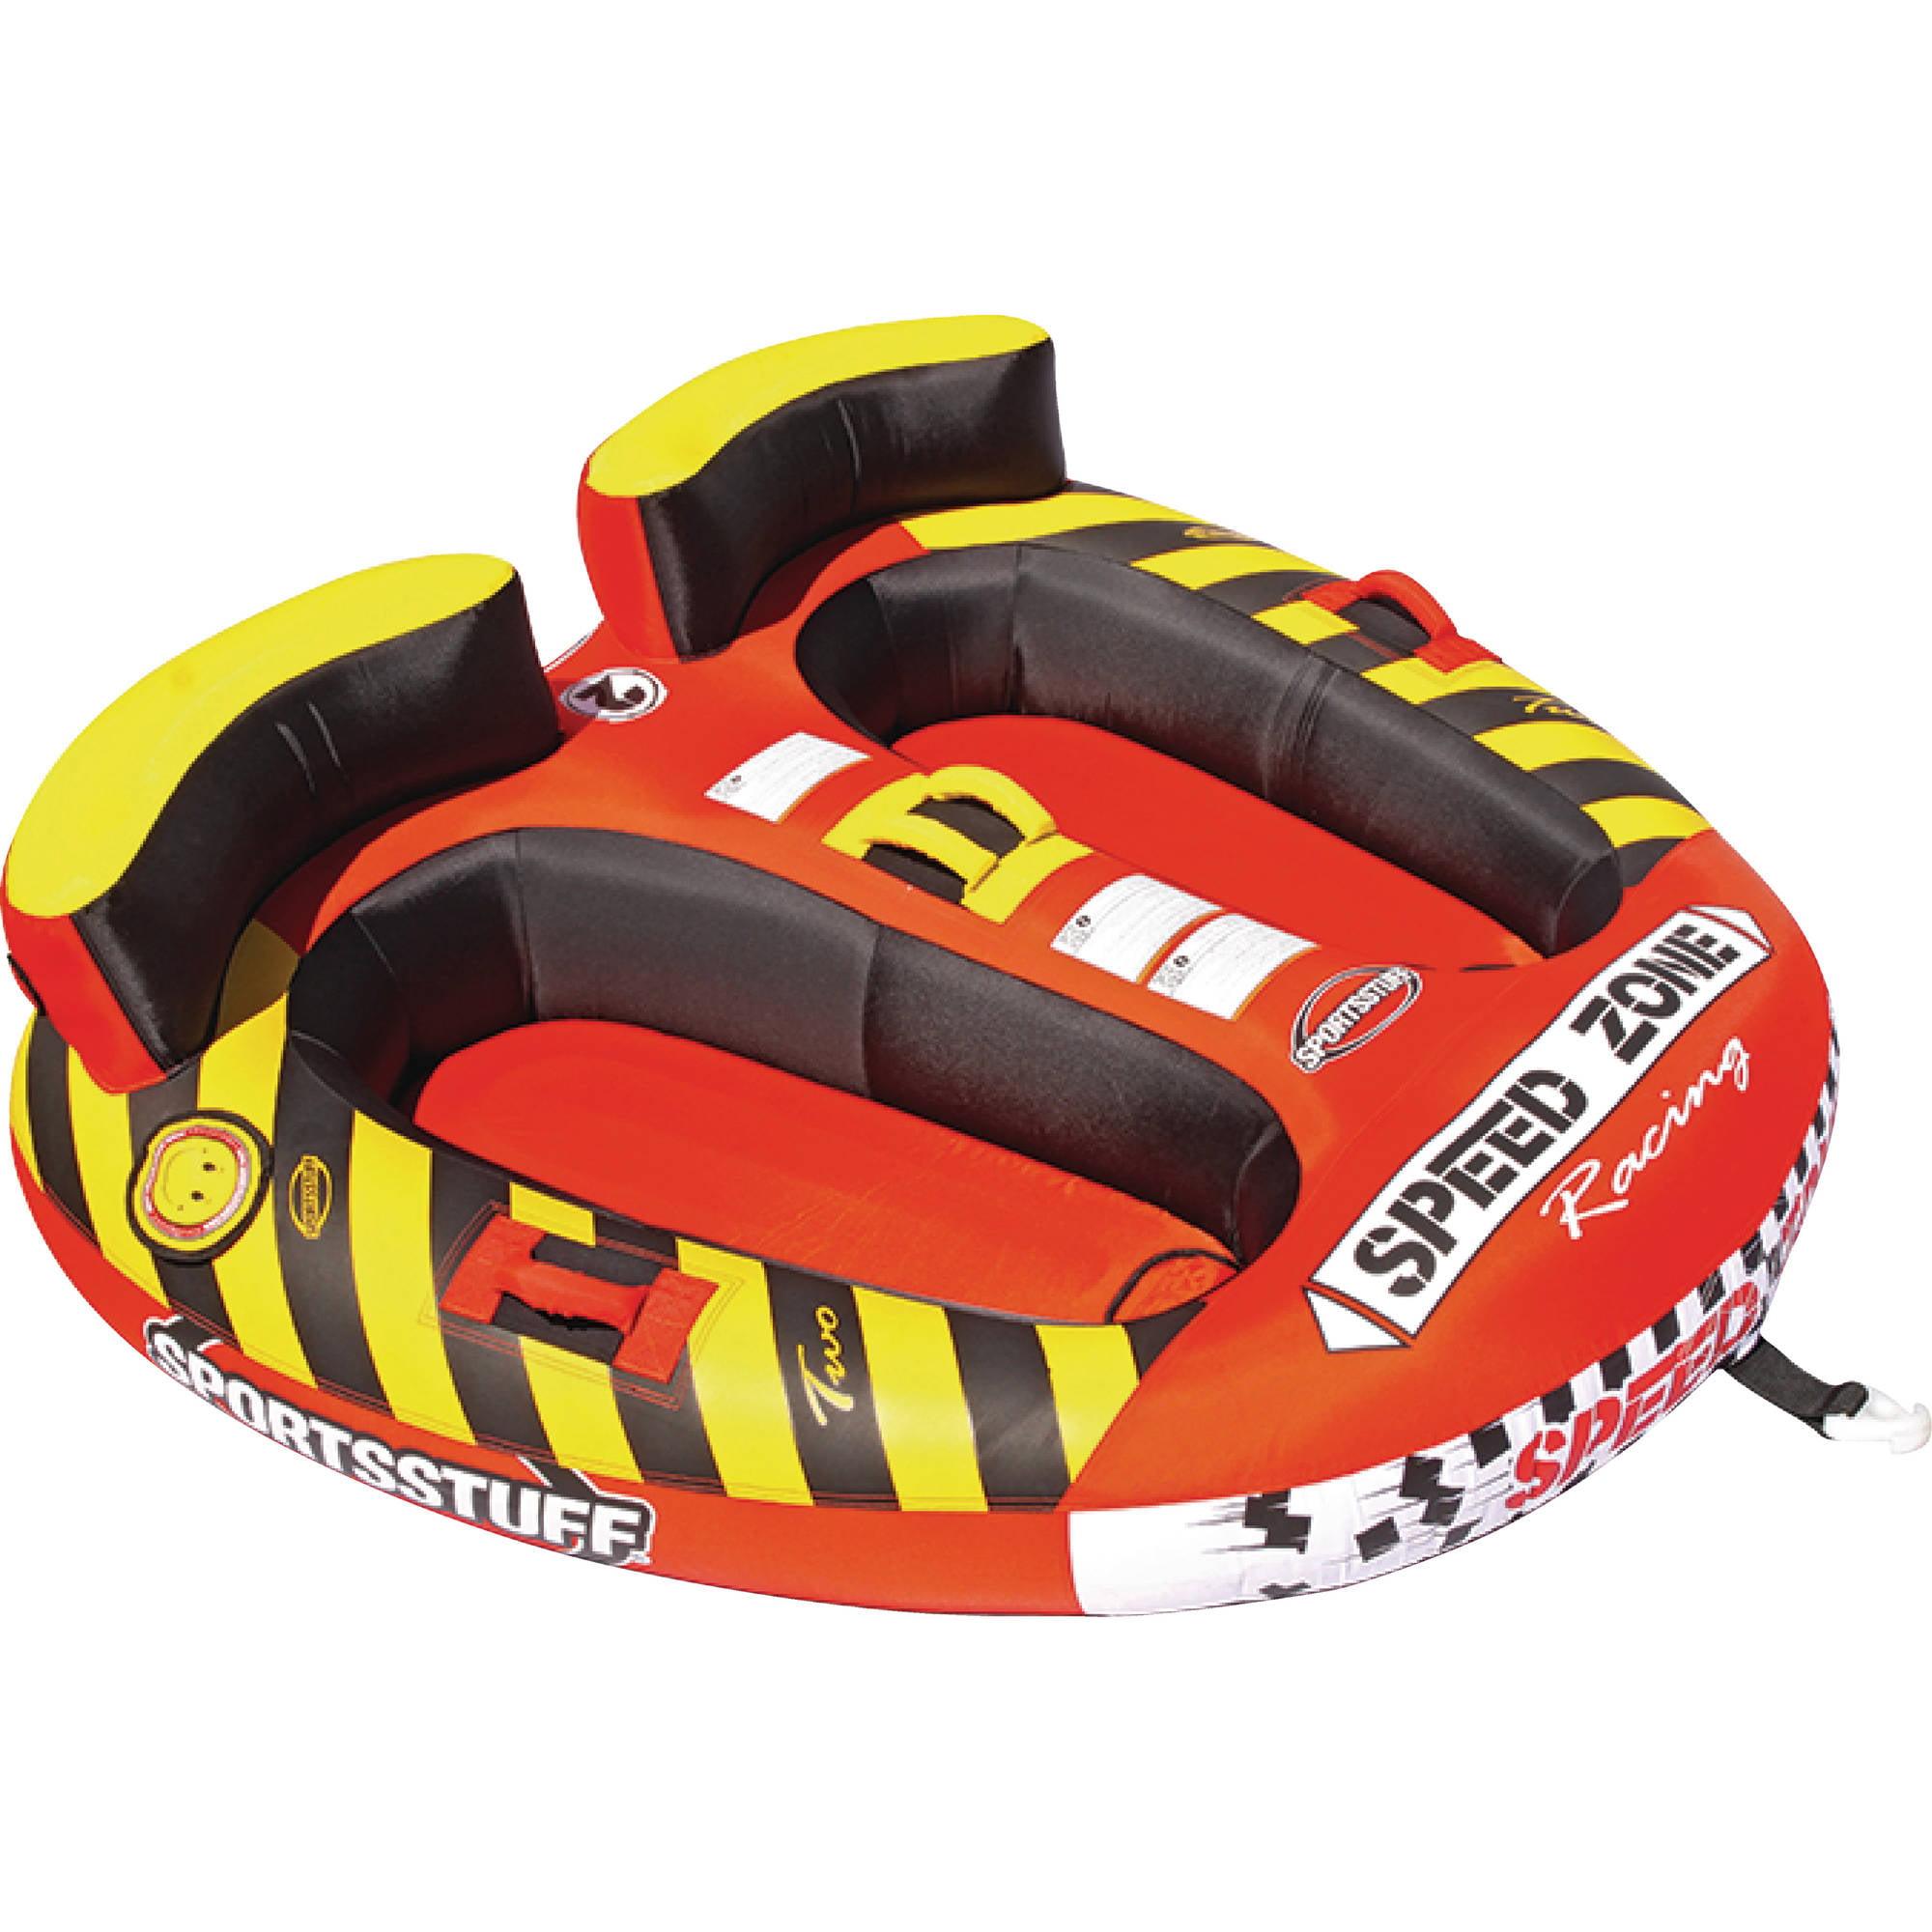 SportsStuff Inflatable Speed Zone Racing Cockpit Wakeboar...